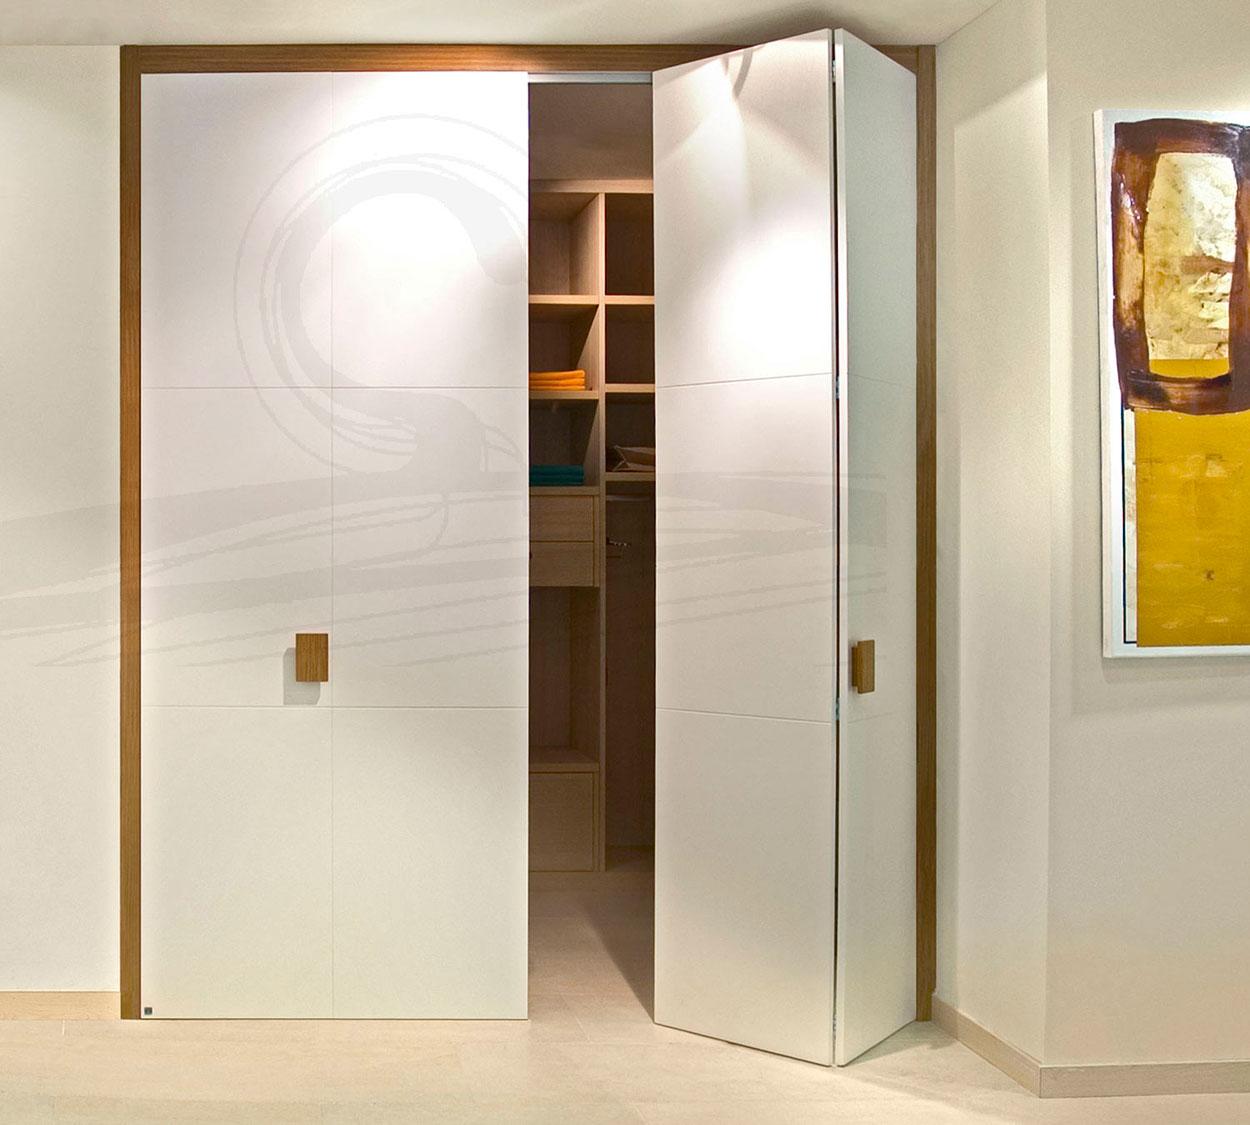 Puertas plegables madera ikea stunning puerta plegable pvc caoba lugano x cm with puertas - Puertas de interior ikea ...